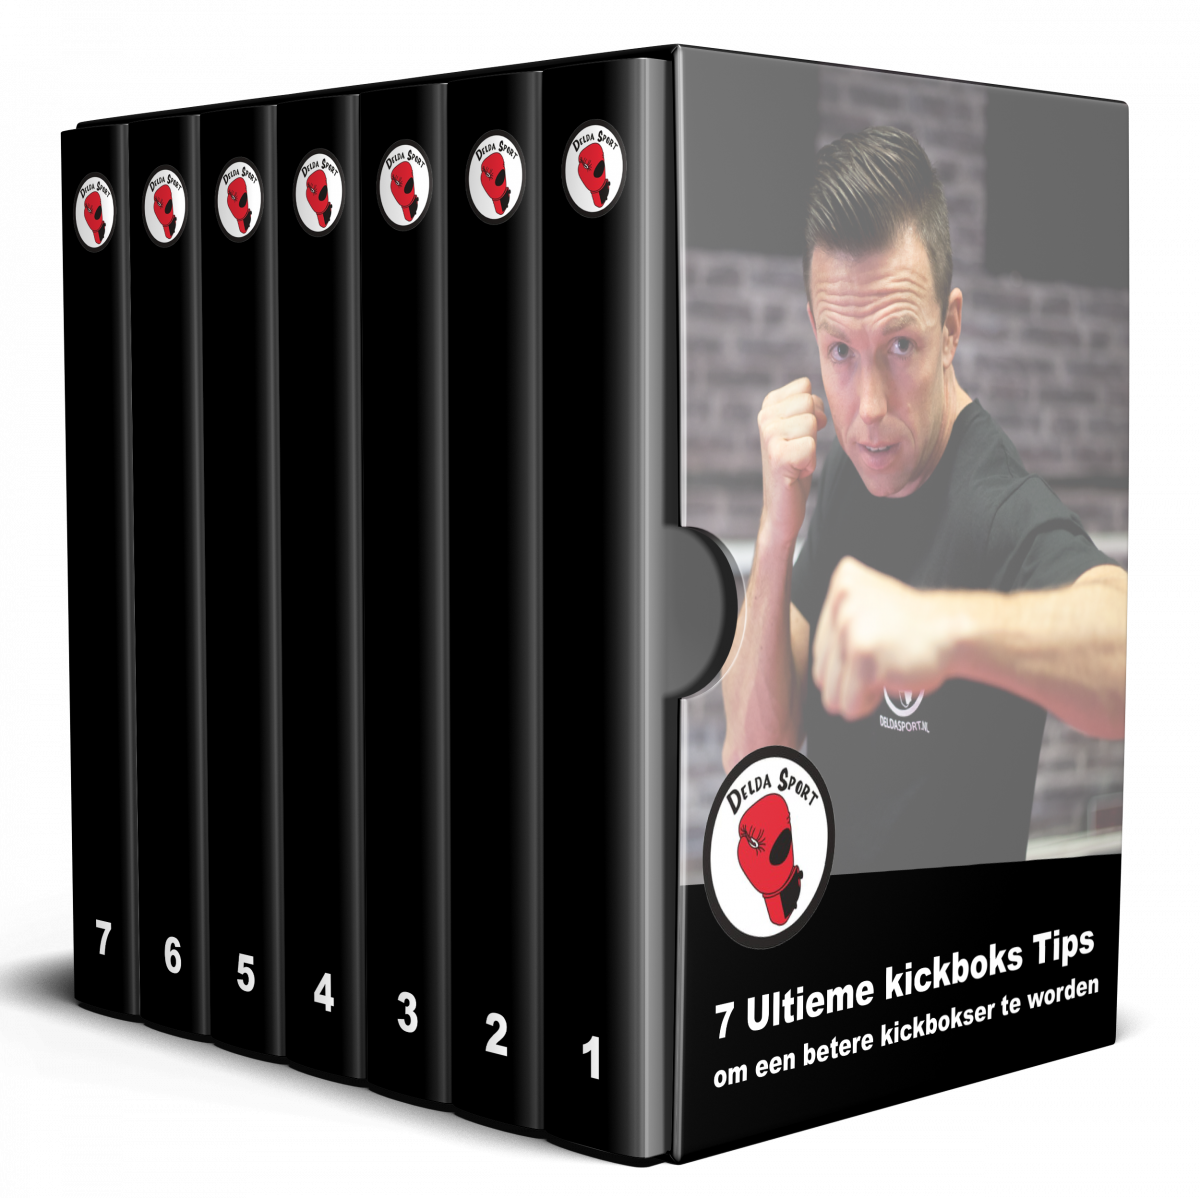 7 ultieme kickboks tips